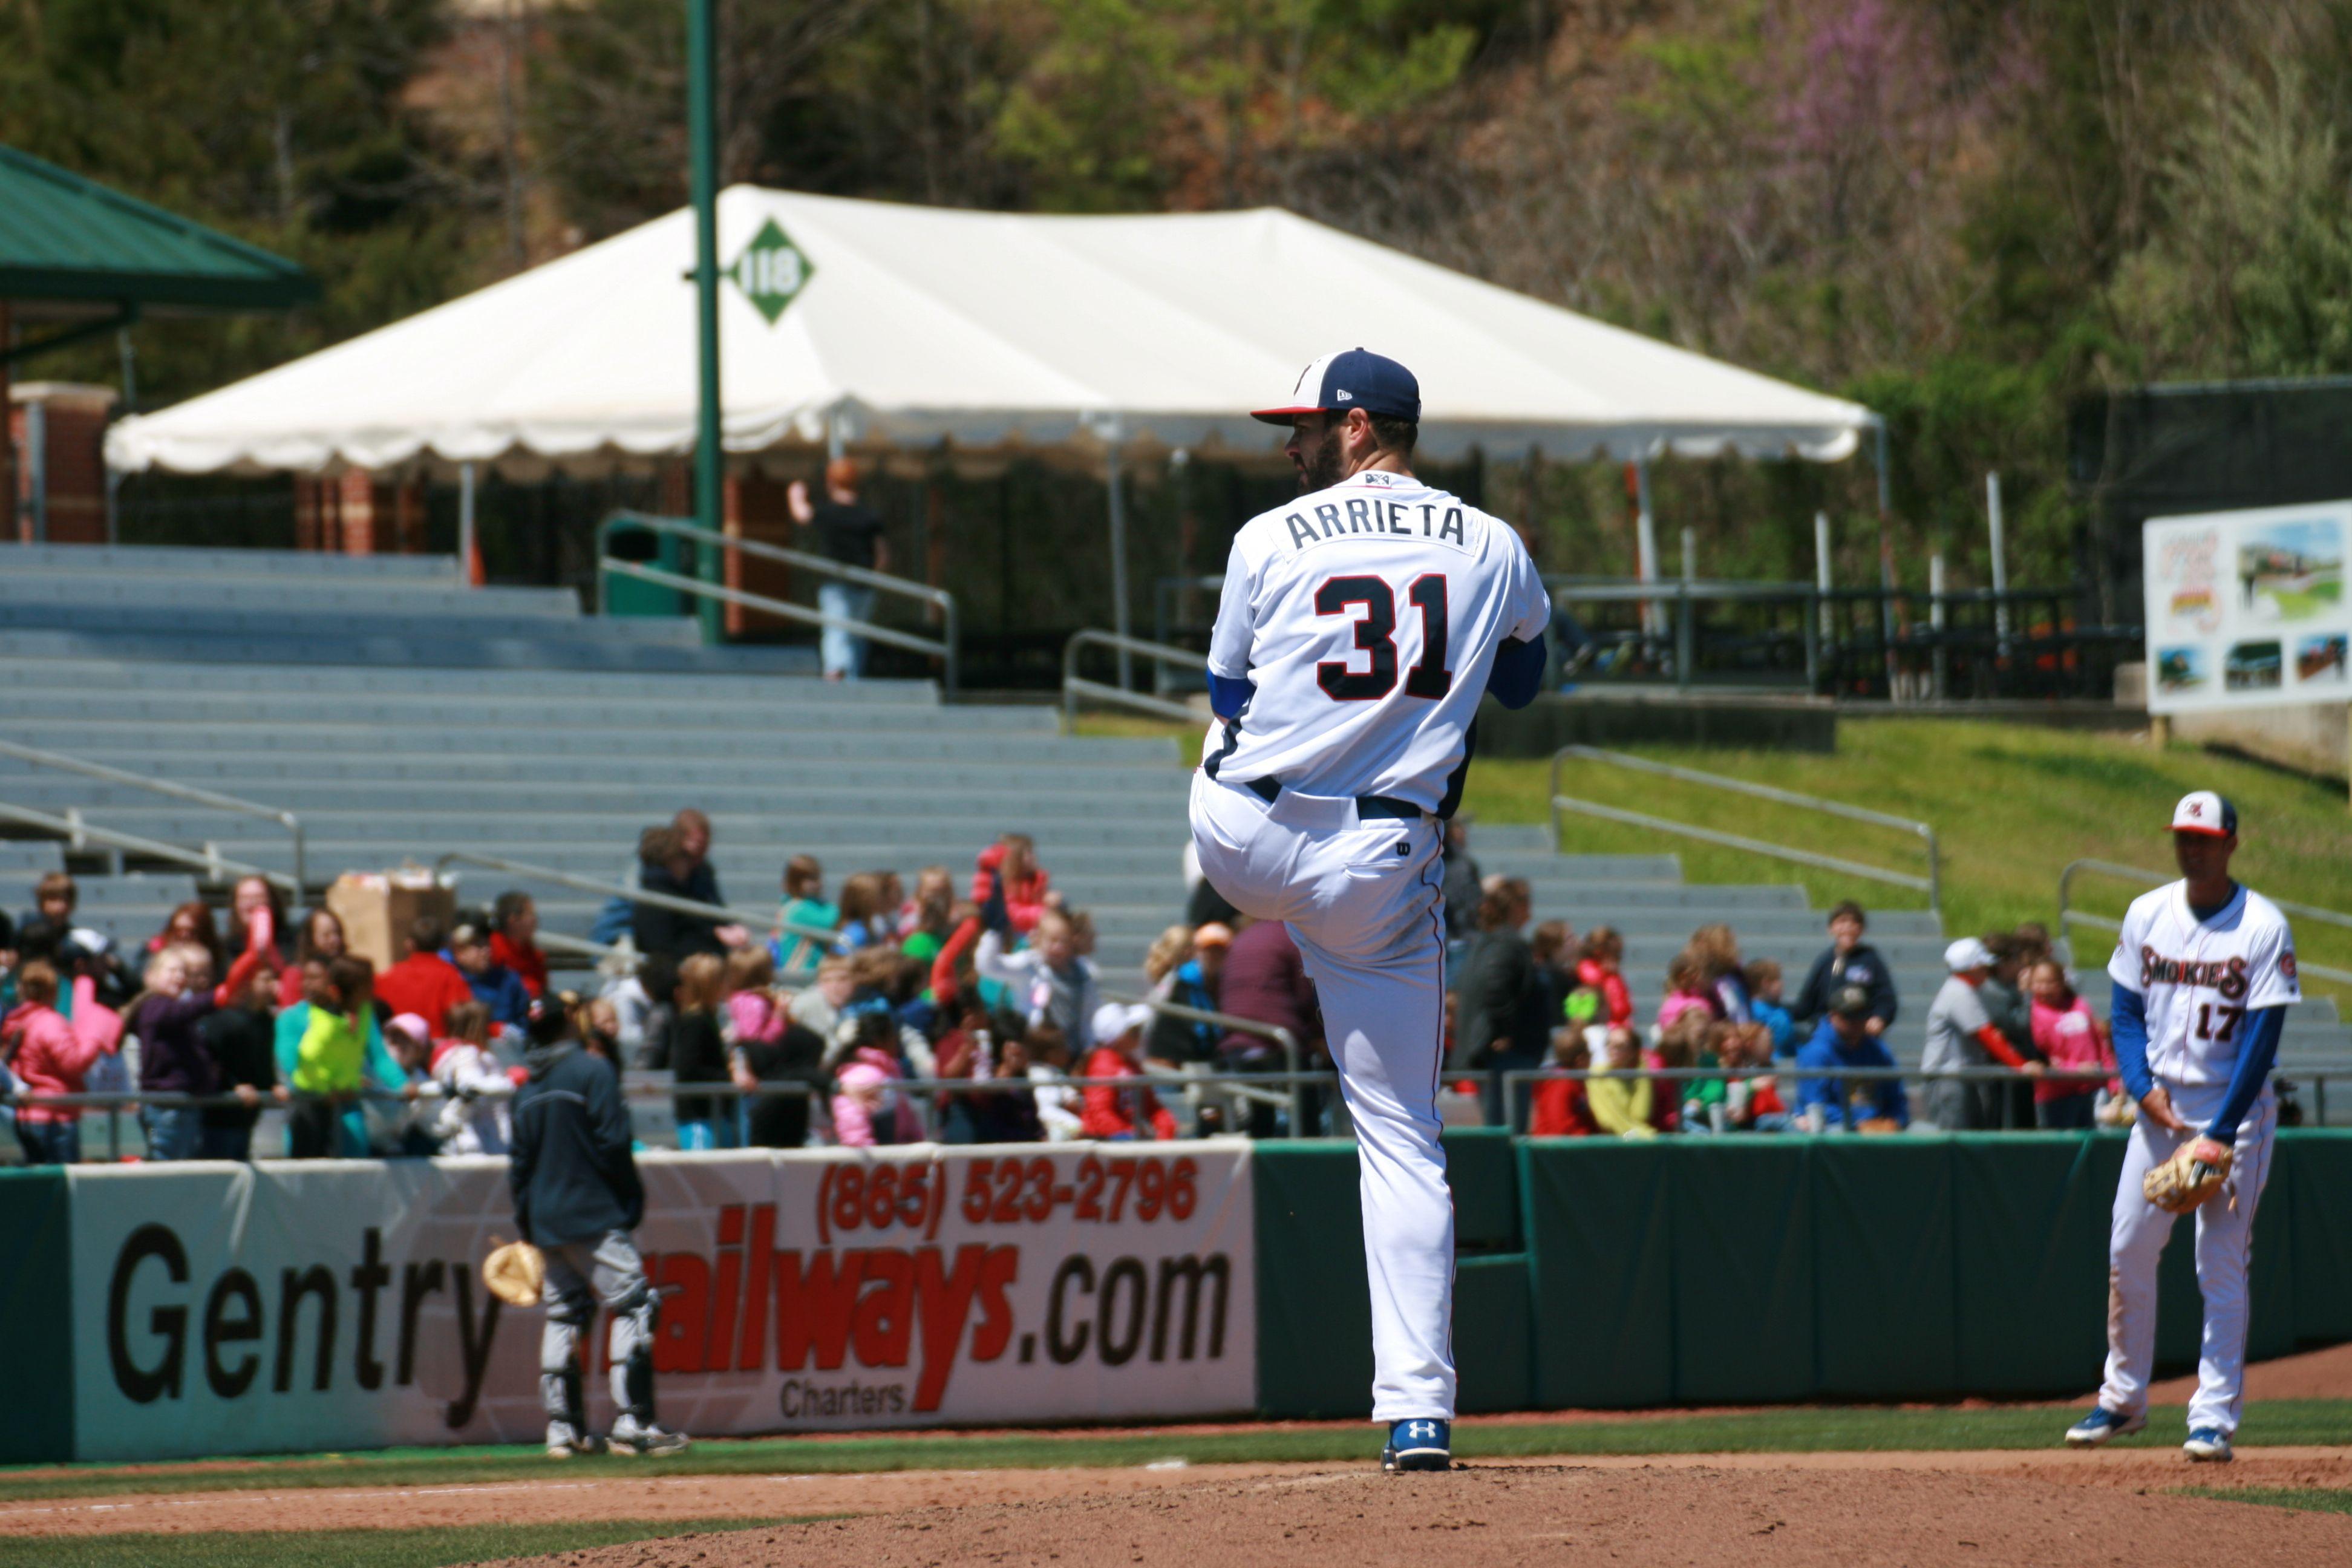 31 Jake Arrieta Tennessee Smokies Minor League Baseball Jake Arrieta